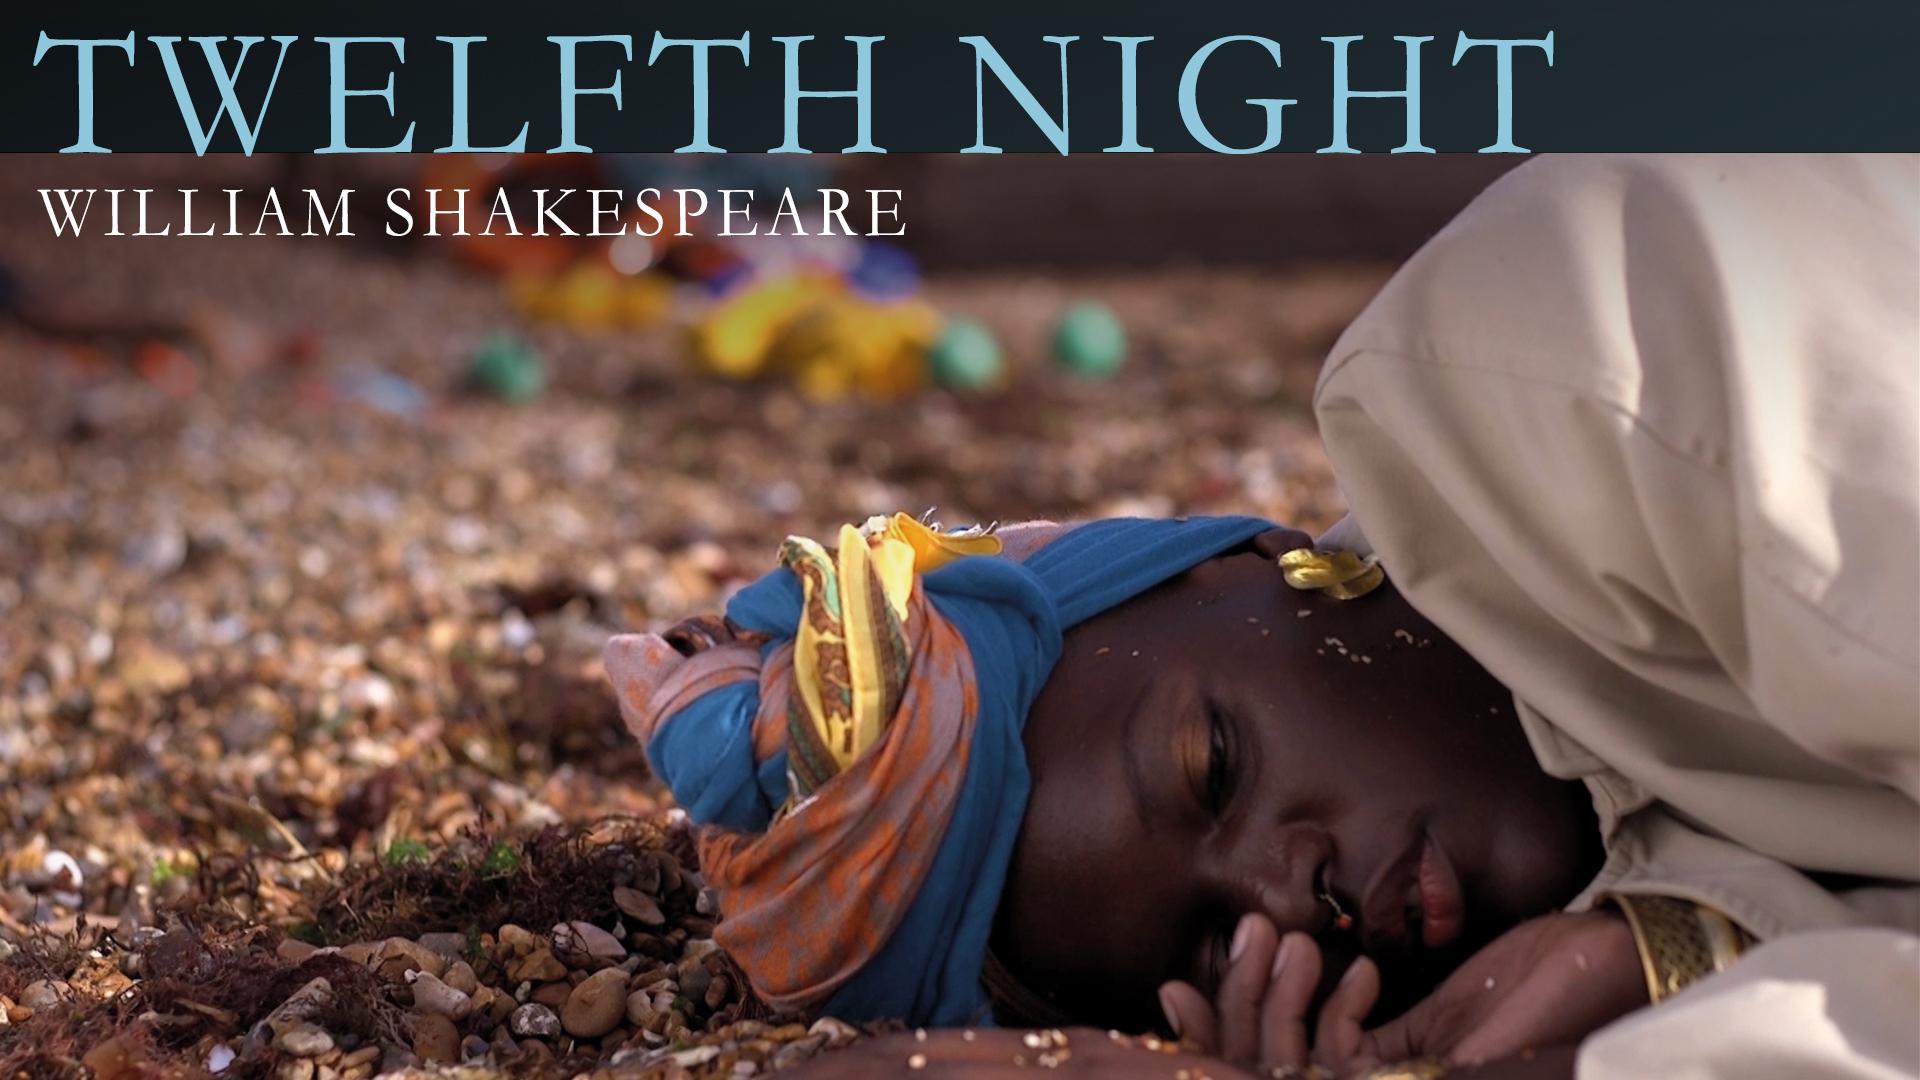 Twelfth Night publicity art